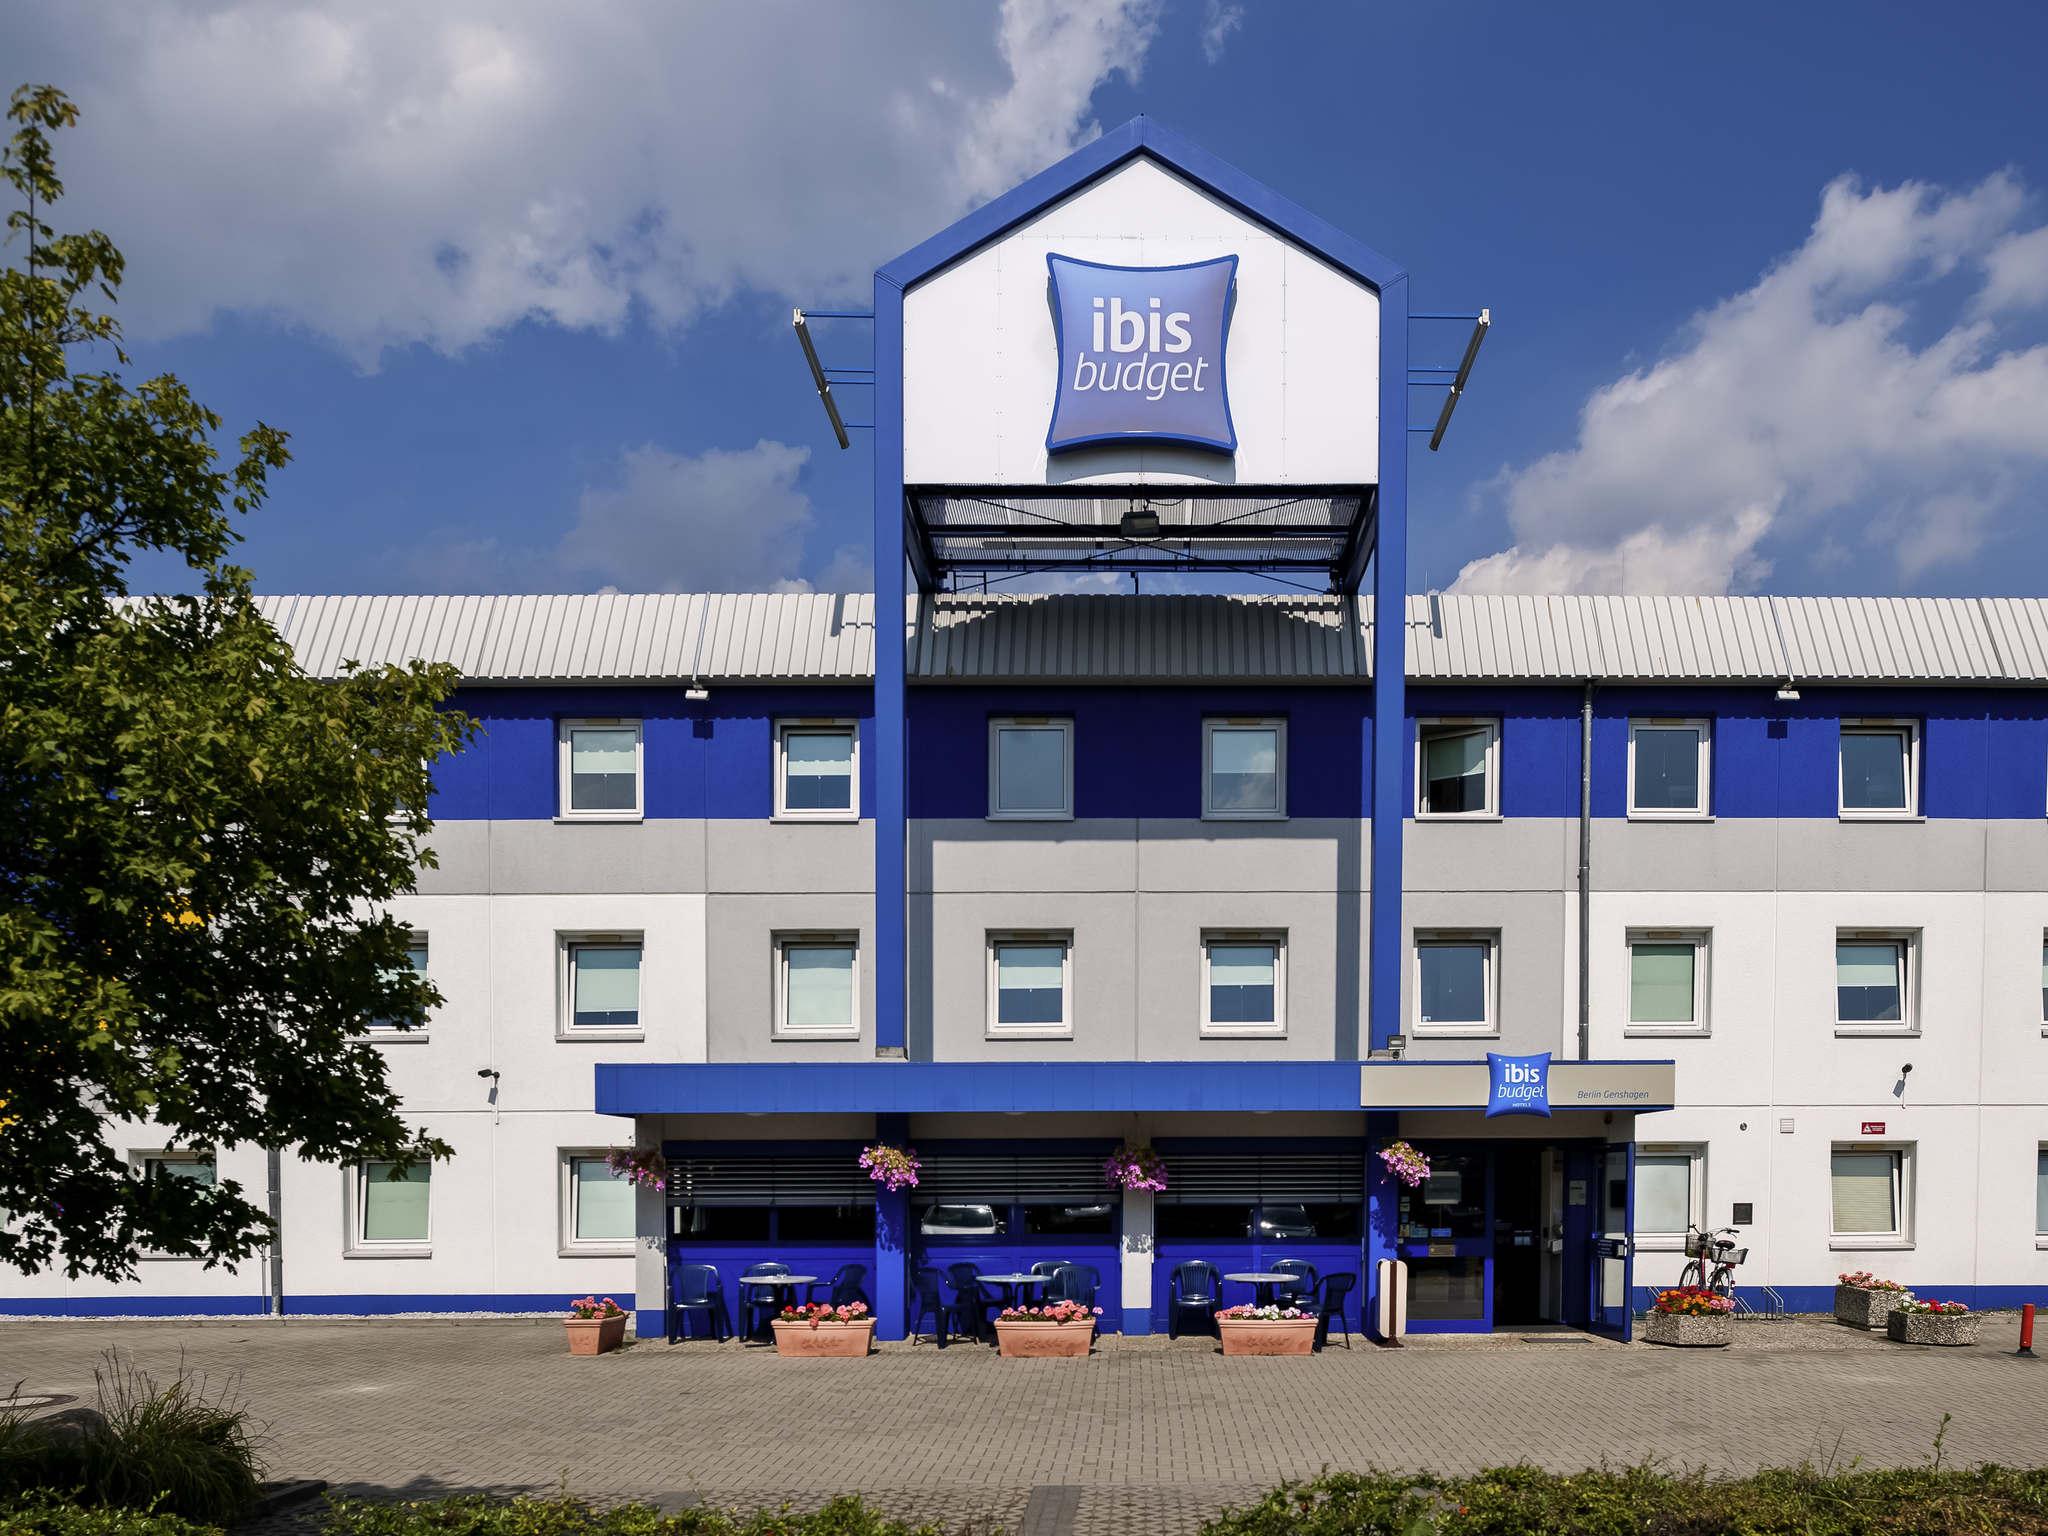 Ibis Hotel Genshagen